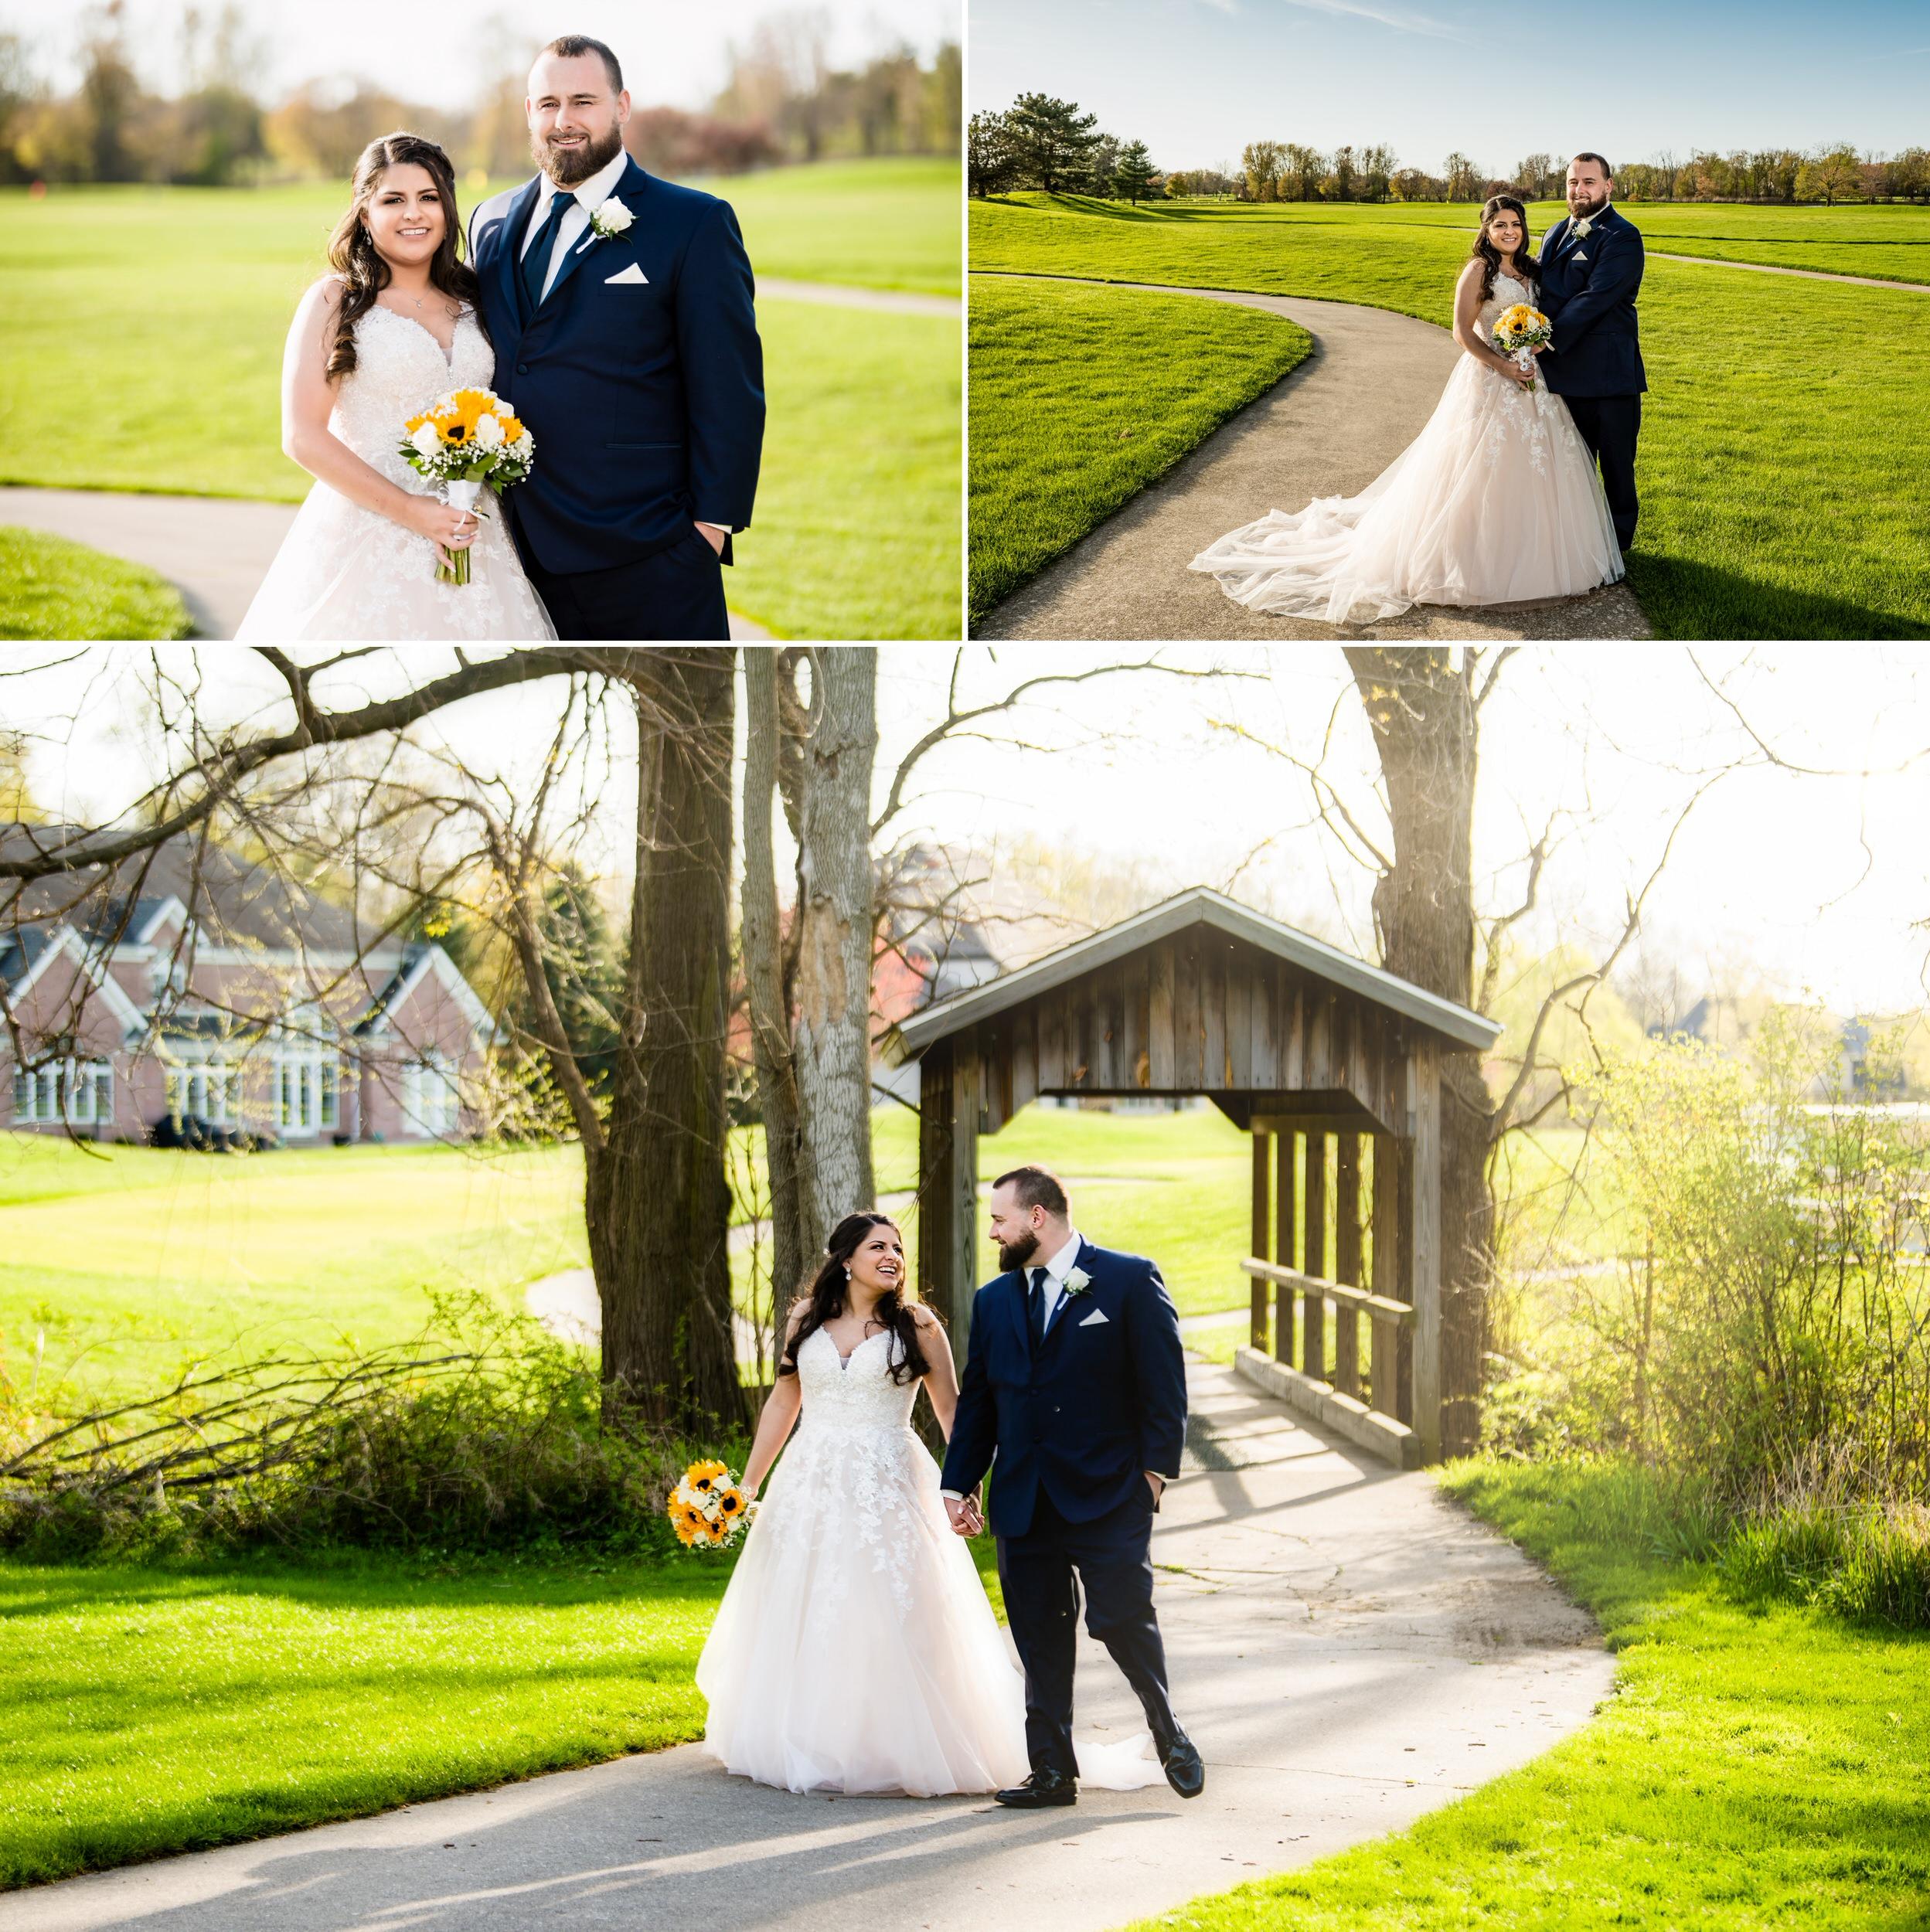 Wedding photos on the golf course at Sand Creek.